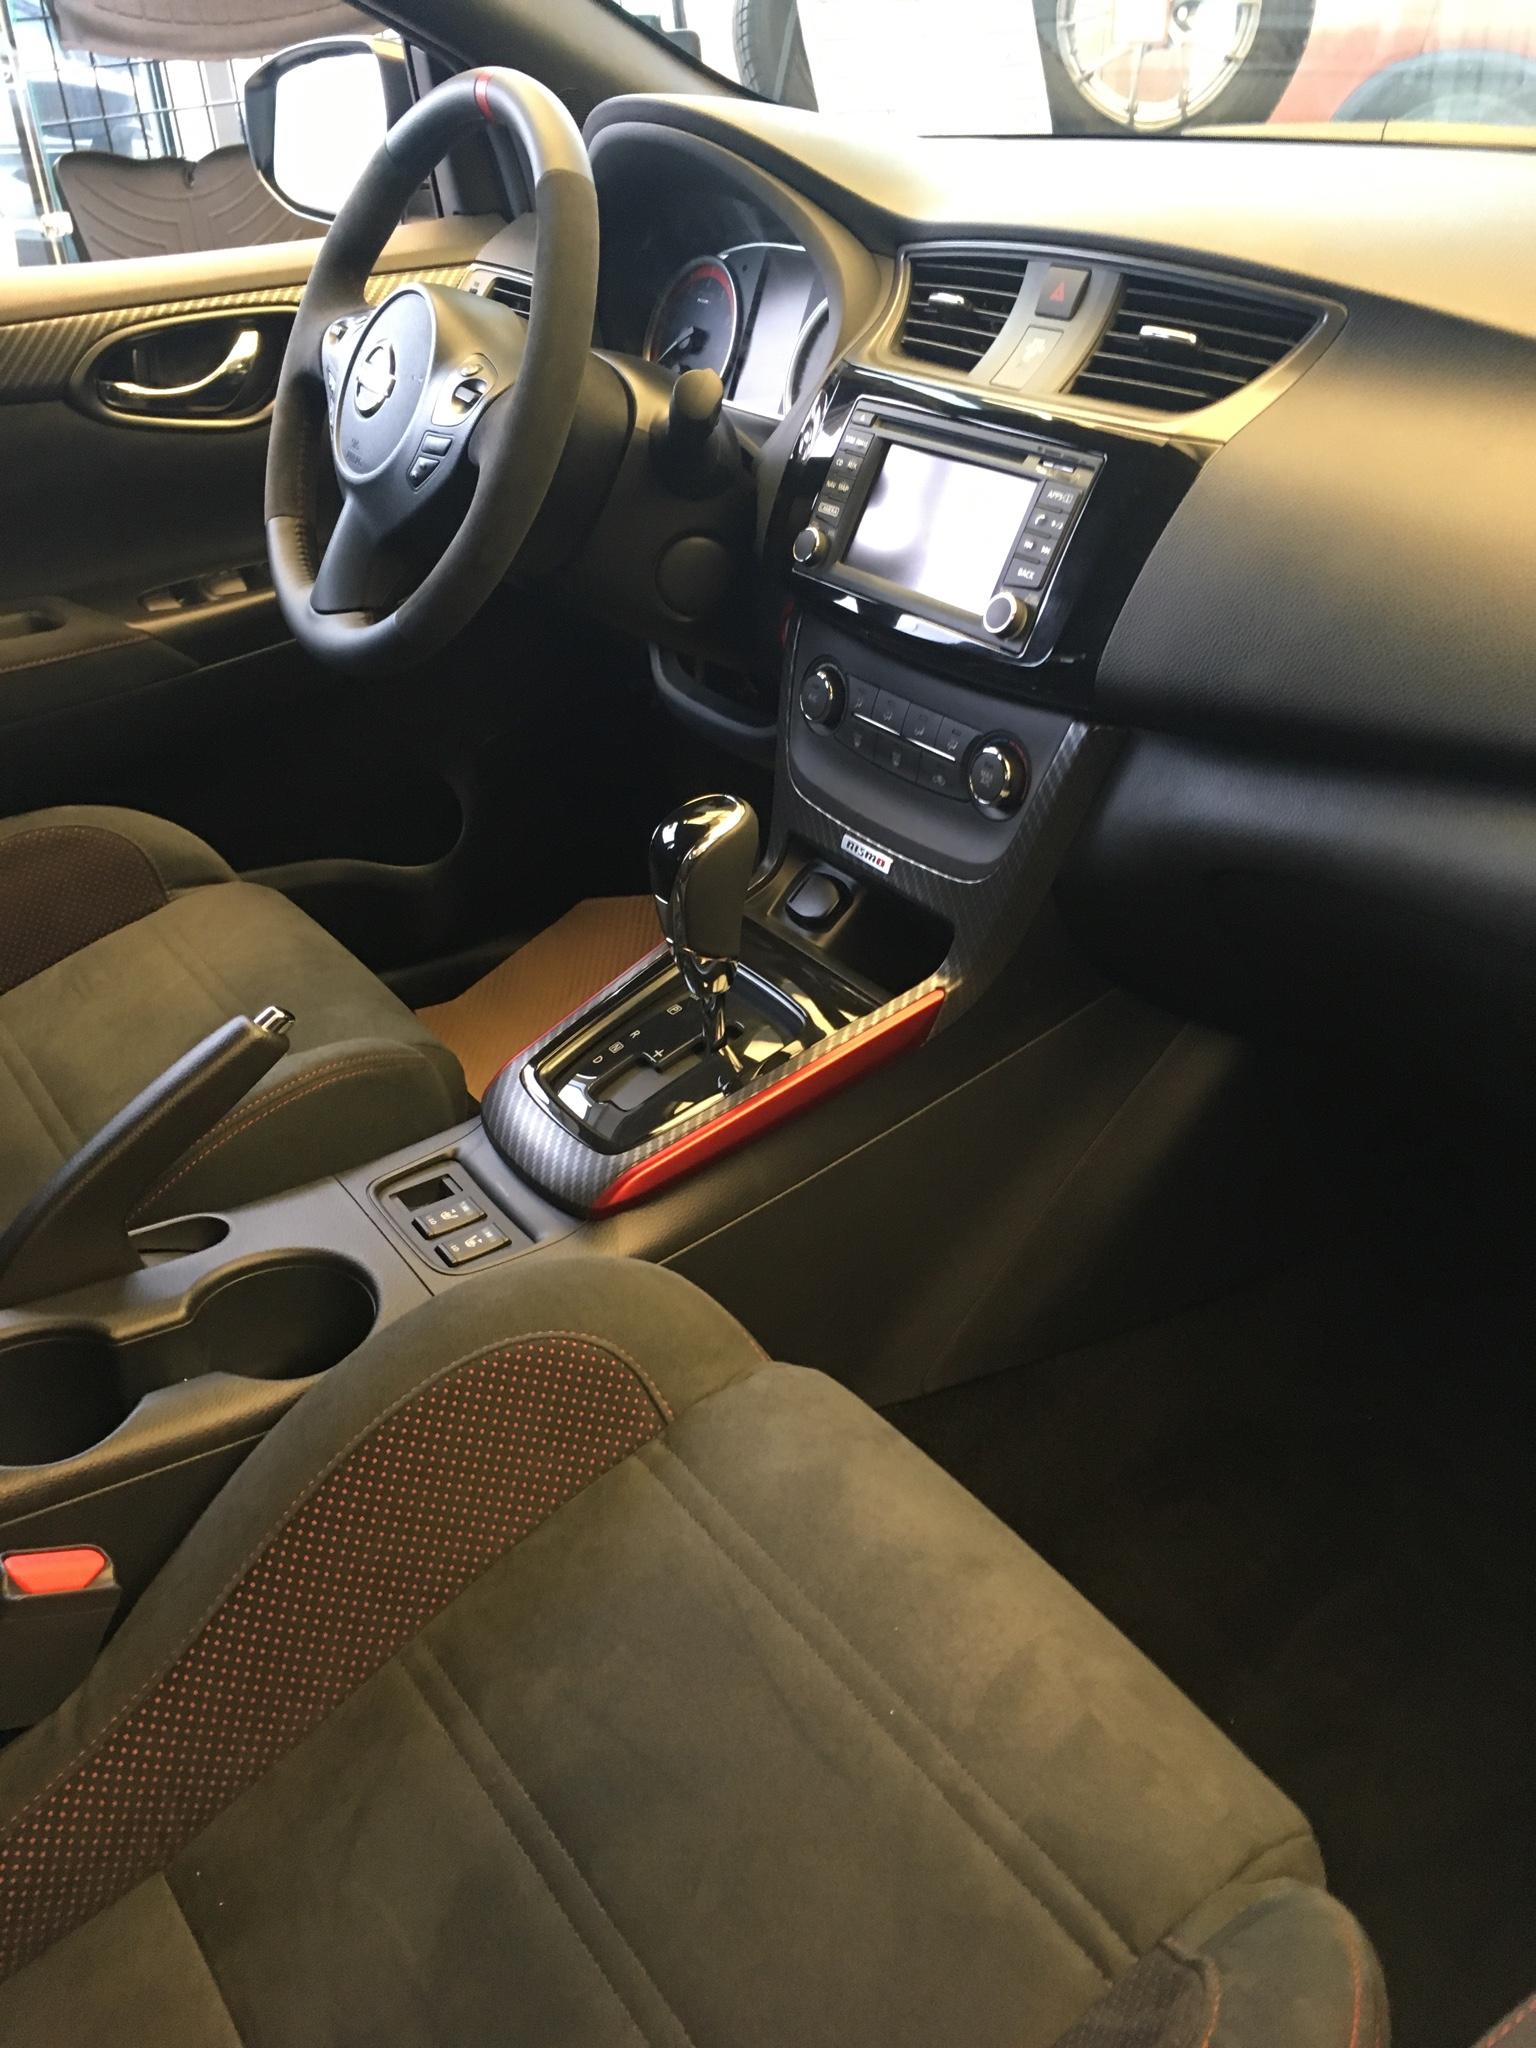 2017 Sentra SR Turbo with same engine as Juke? - Page 2